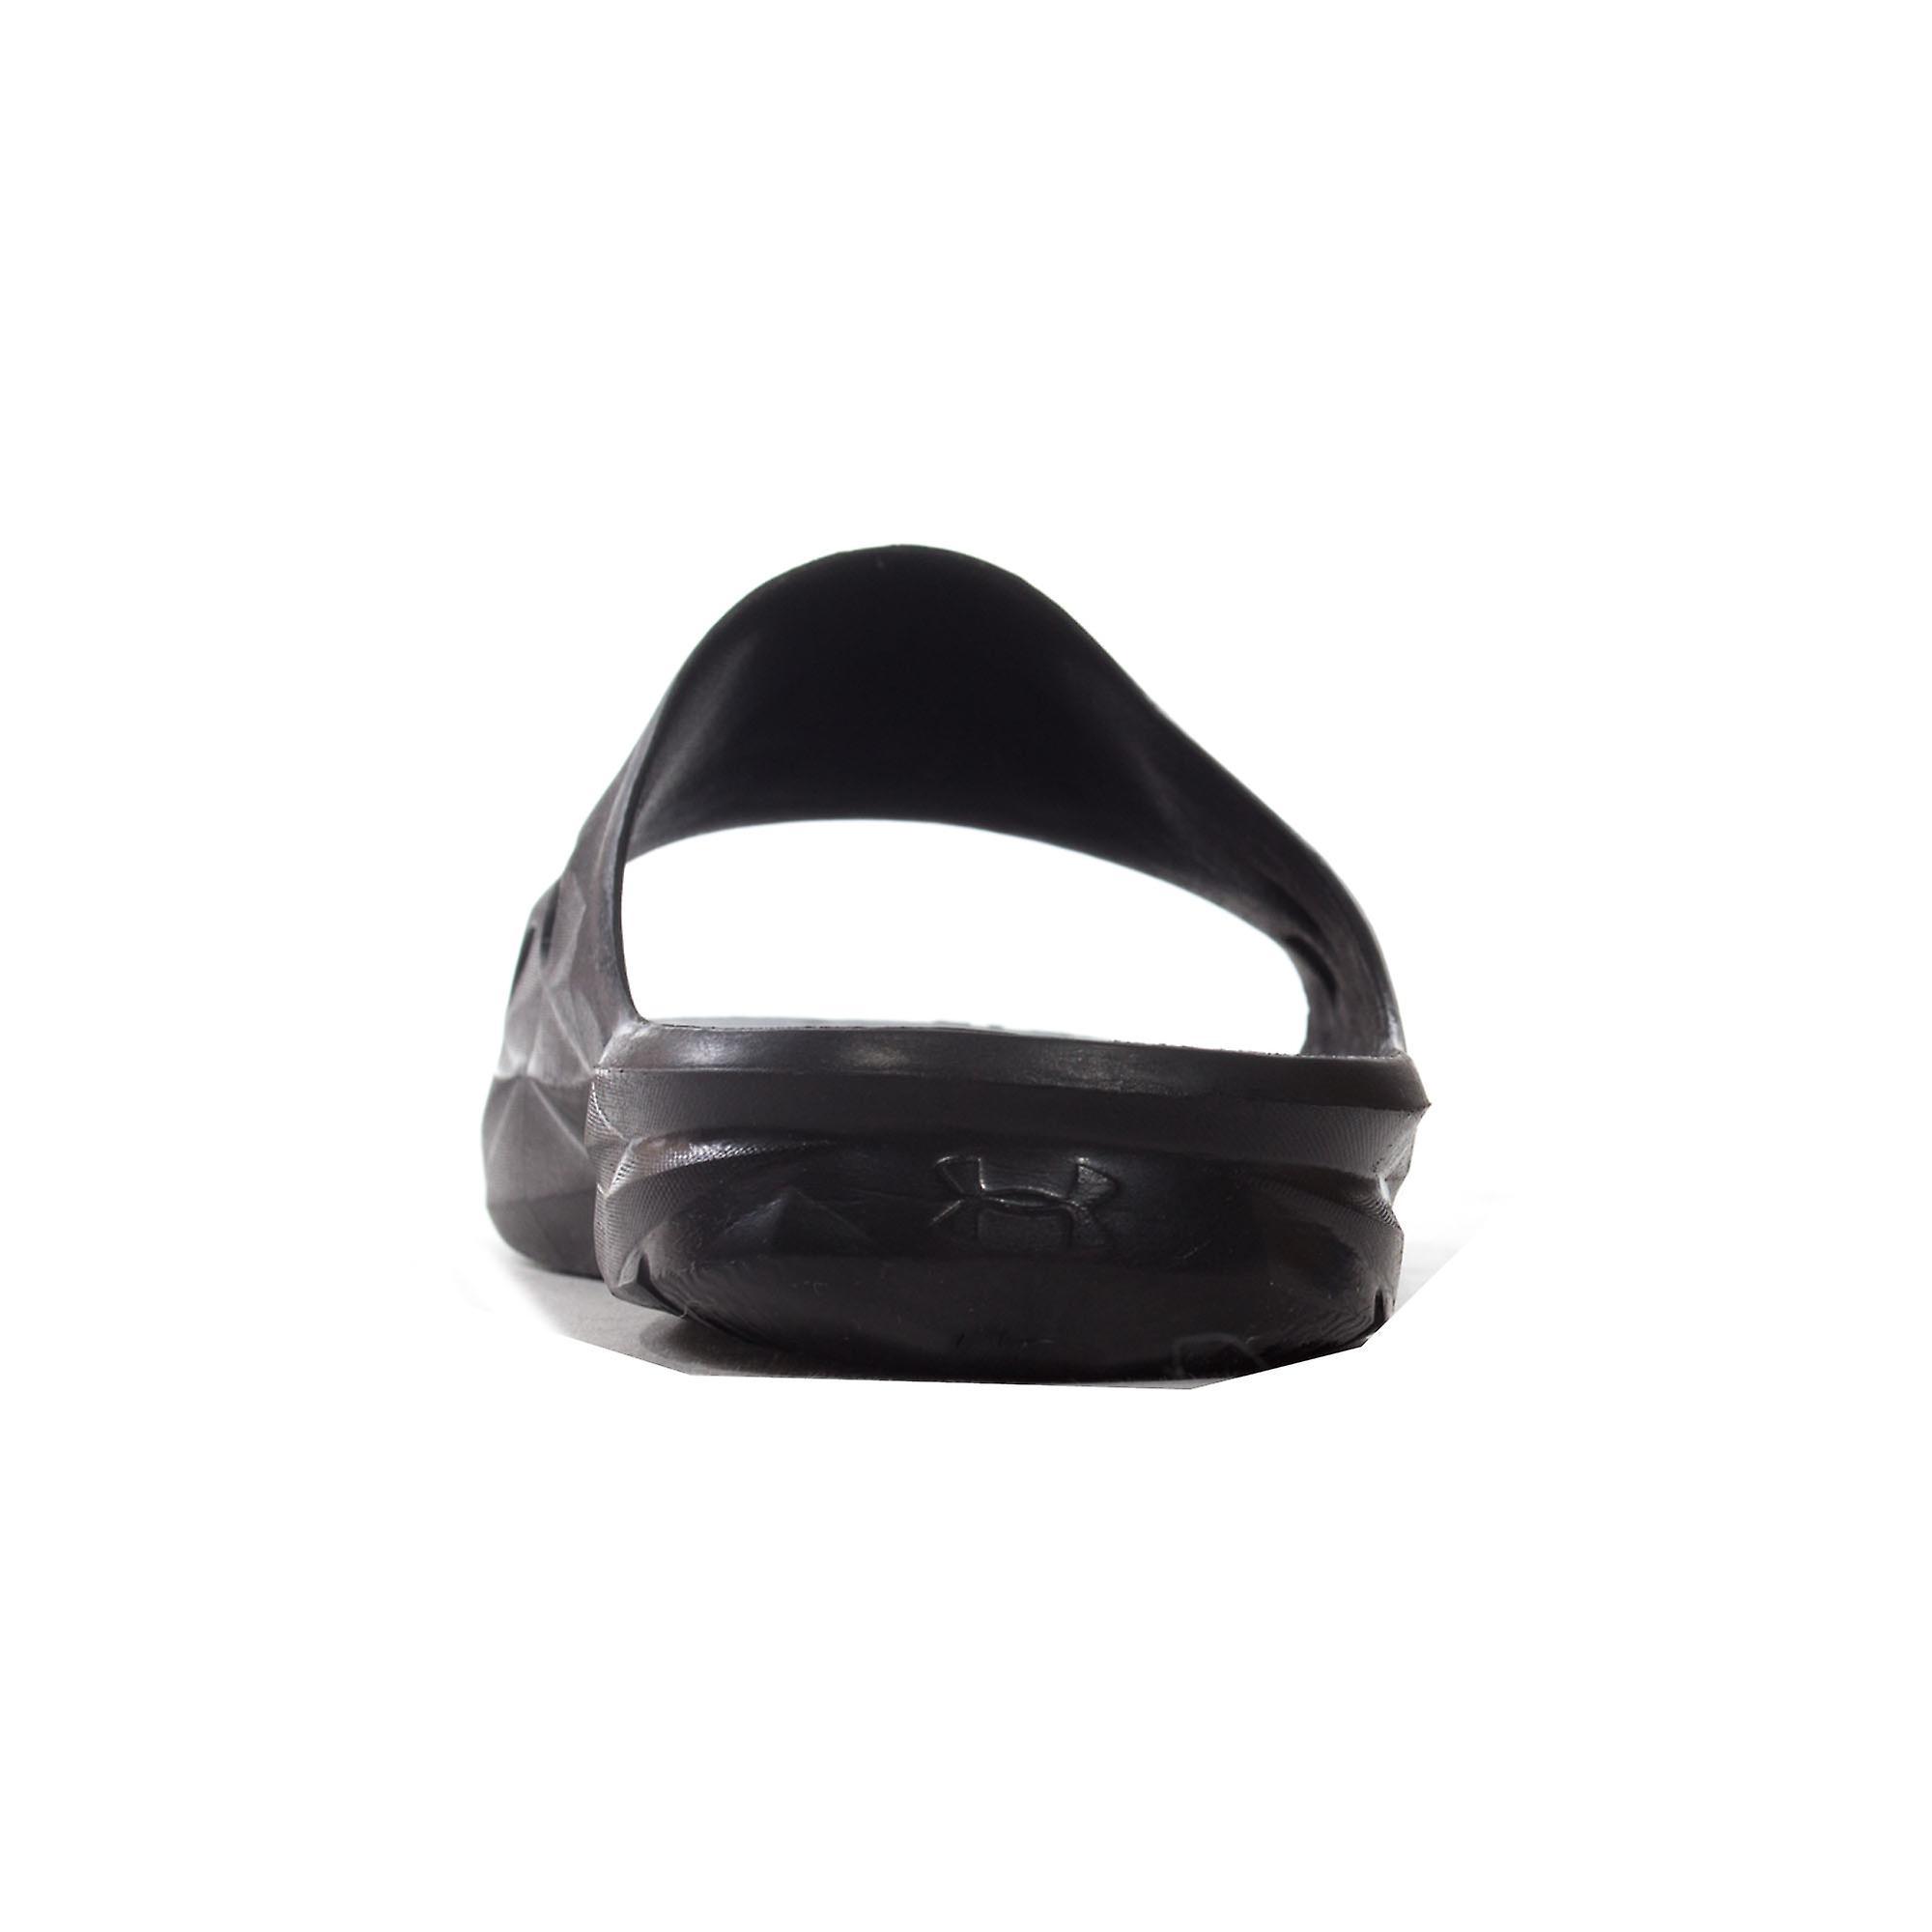 Under Armour Locker III Mens Adults Flip Flop Sandal Slide Black